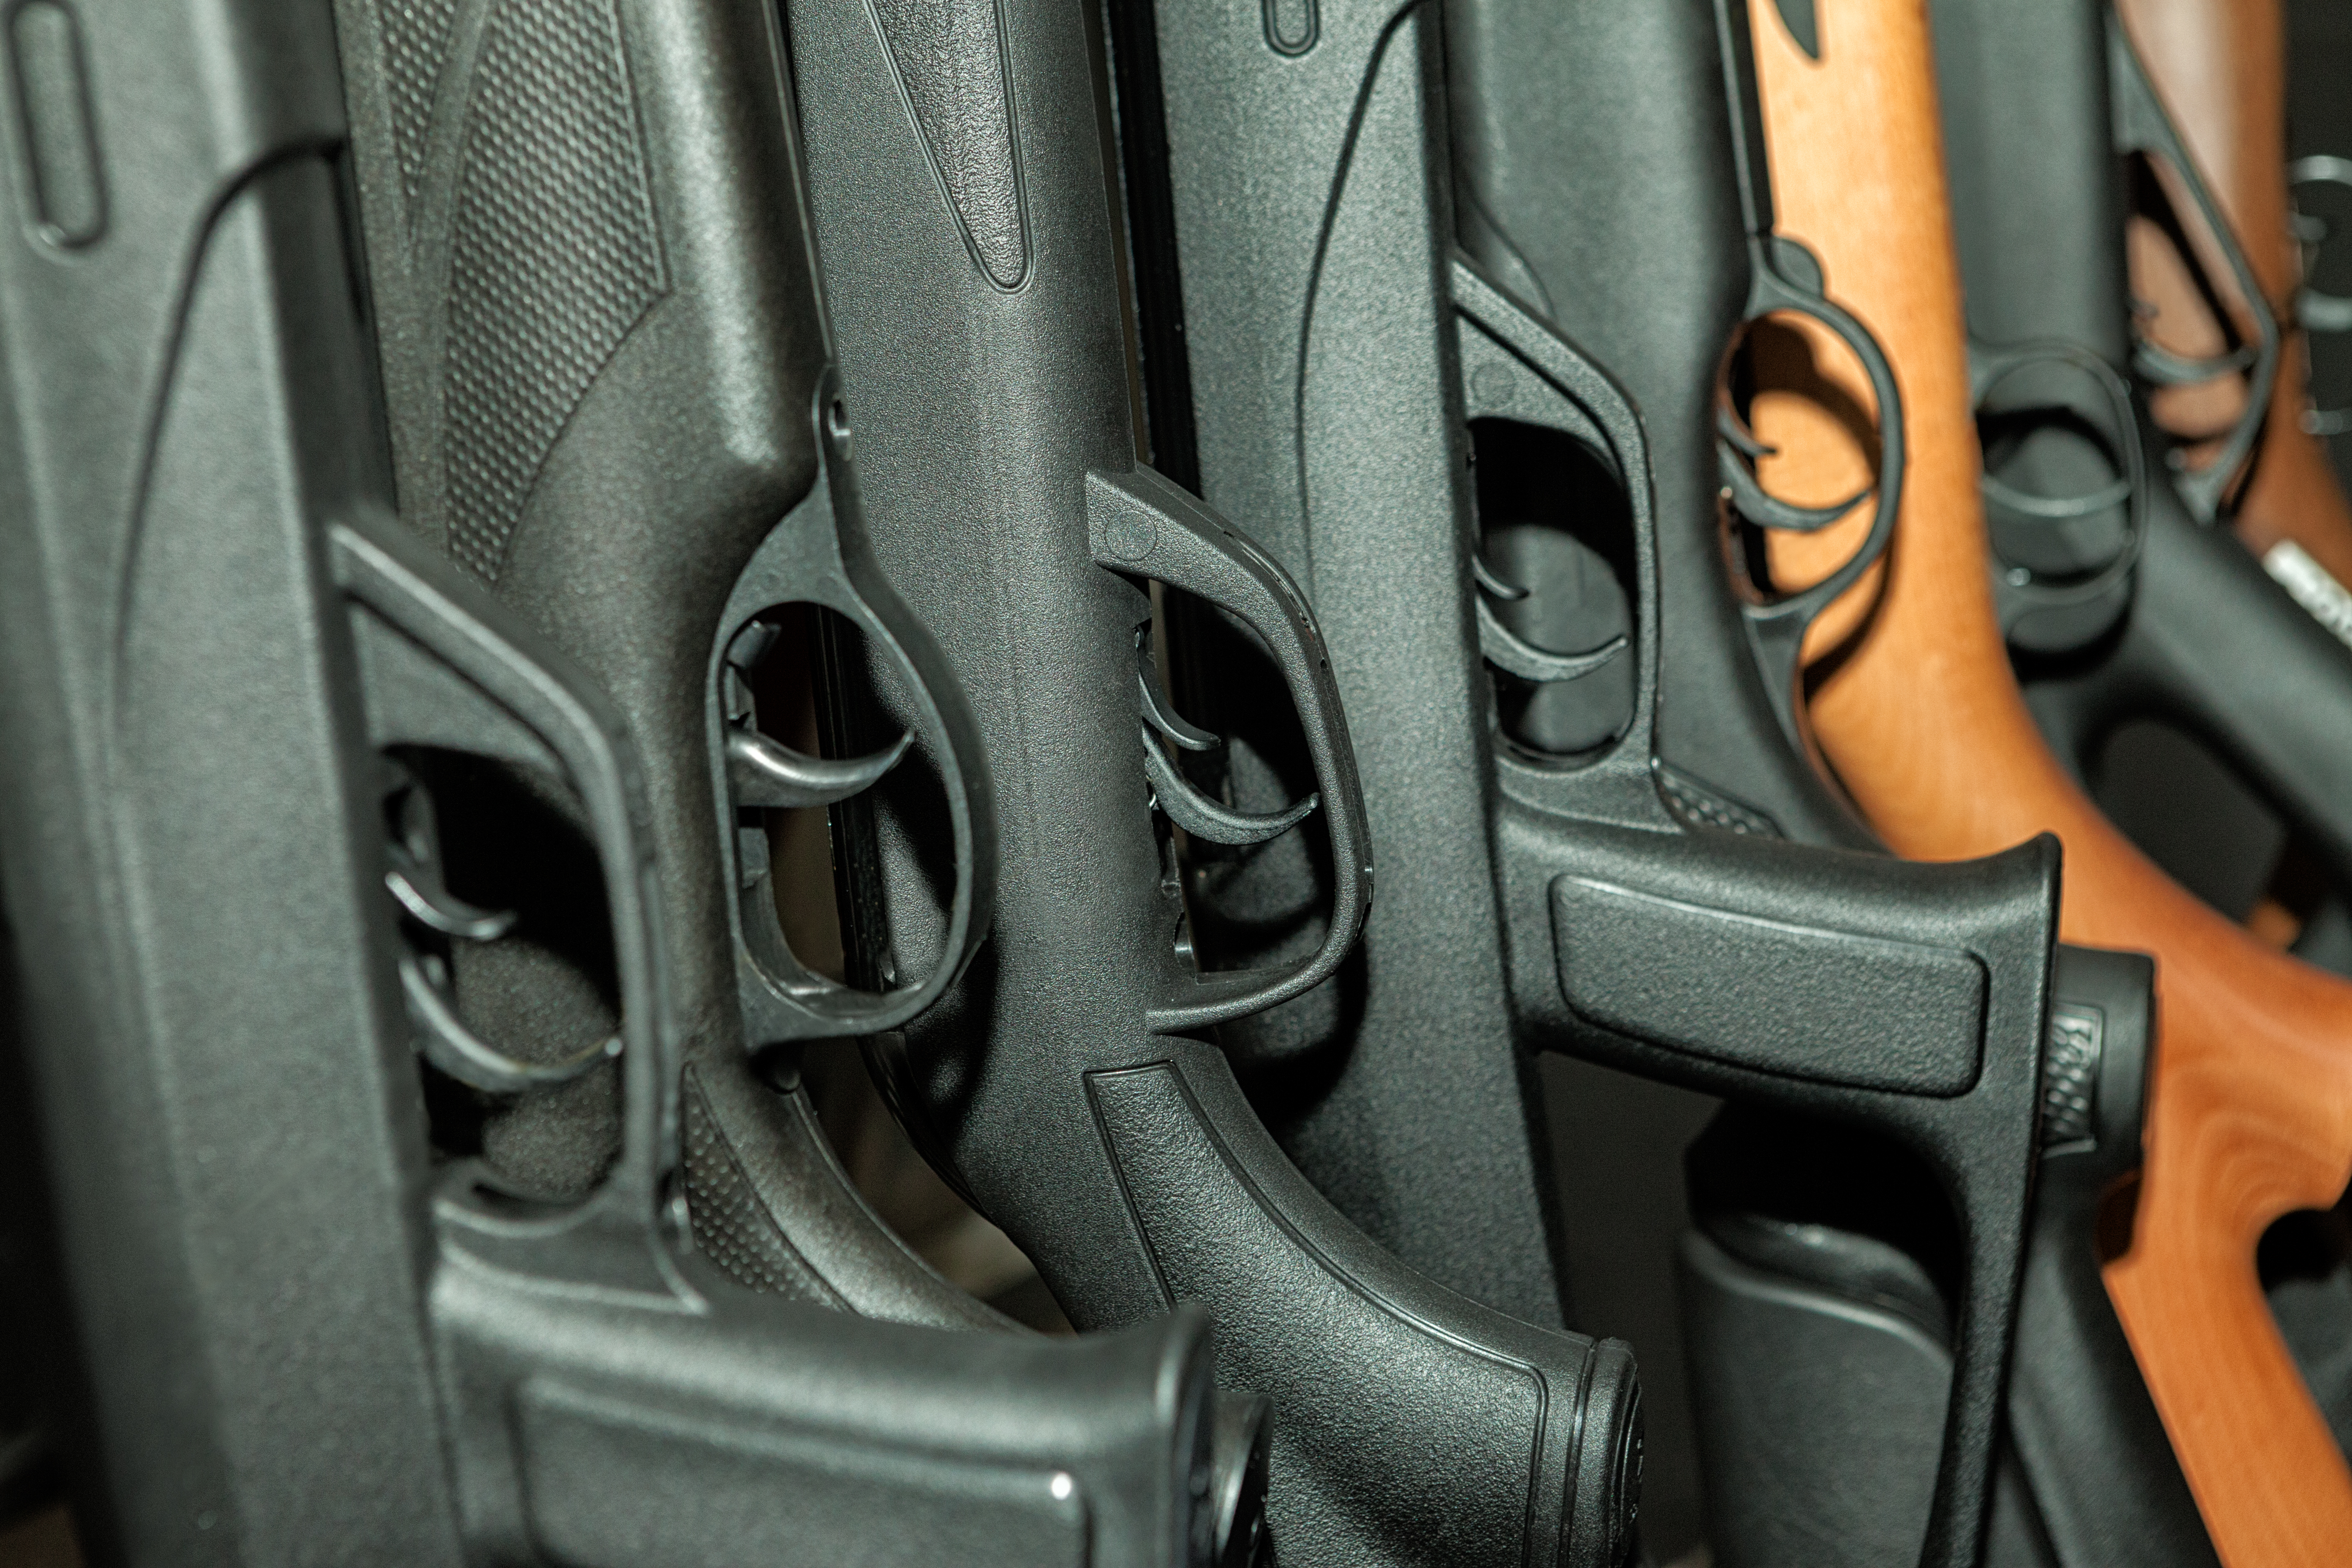 Beretta shotgun collection